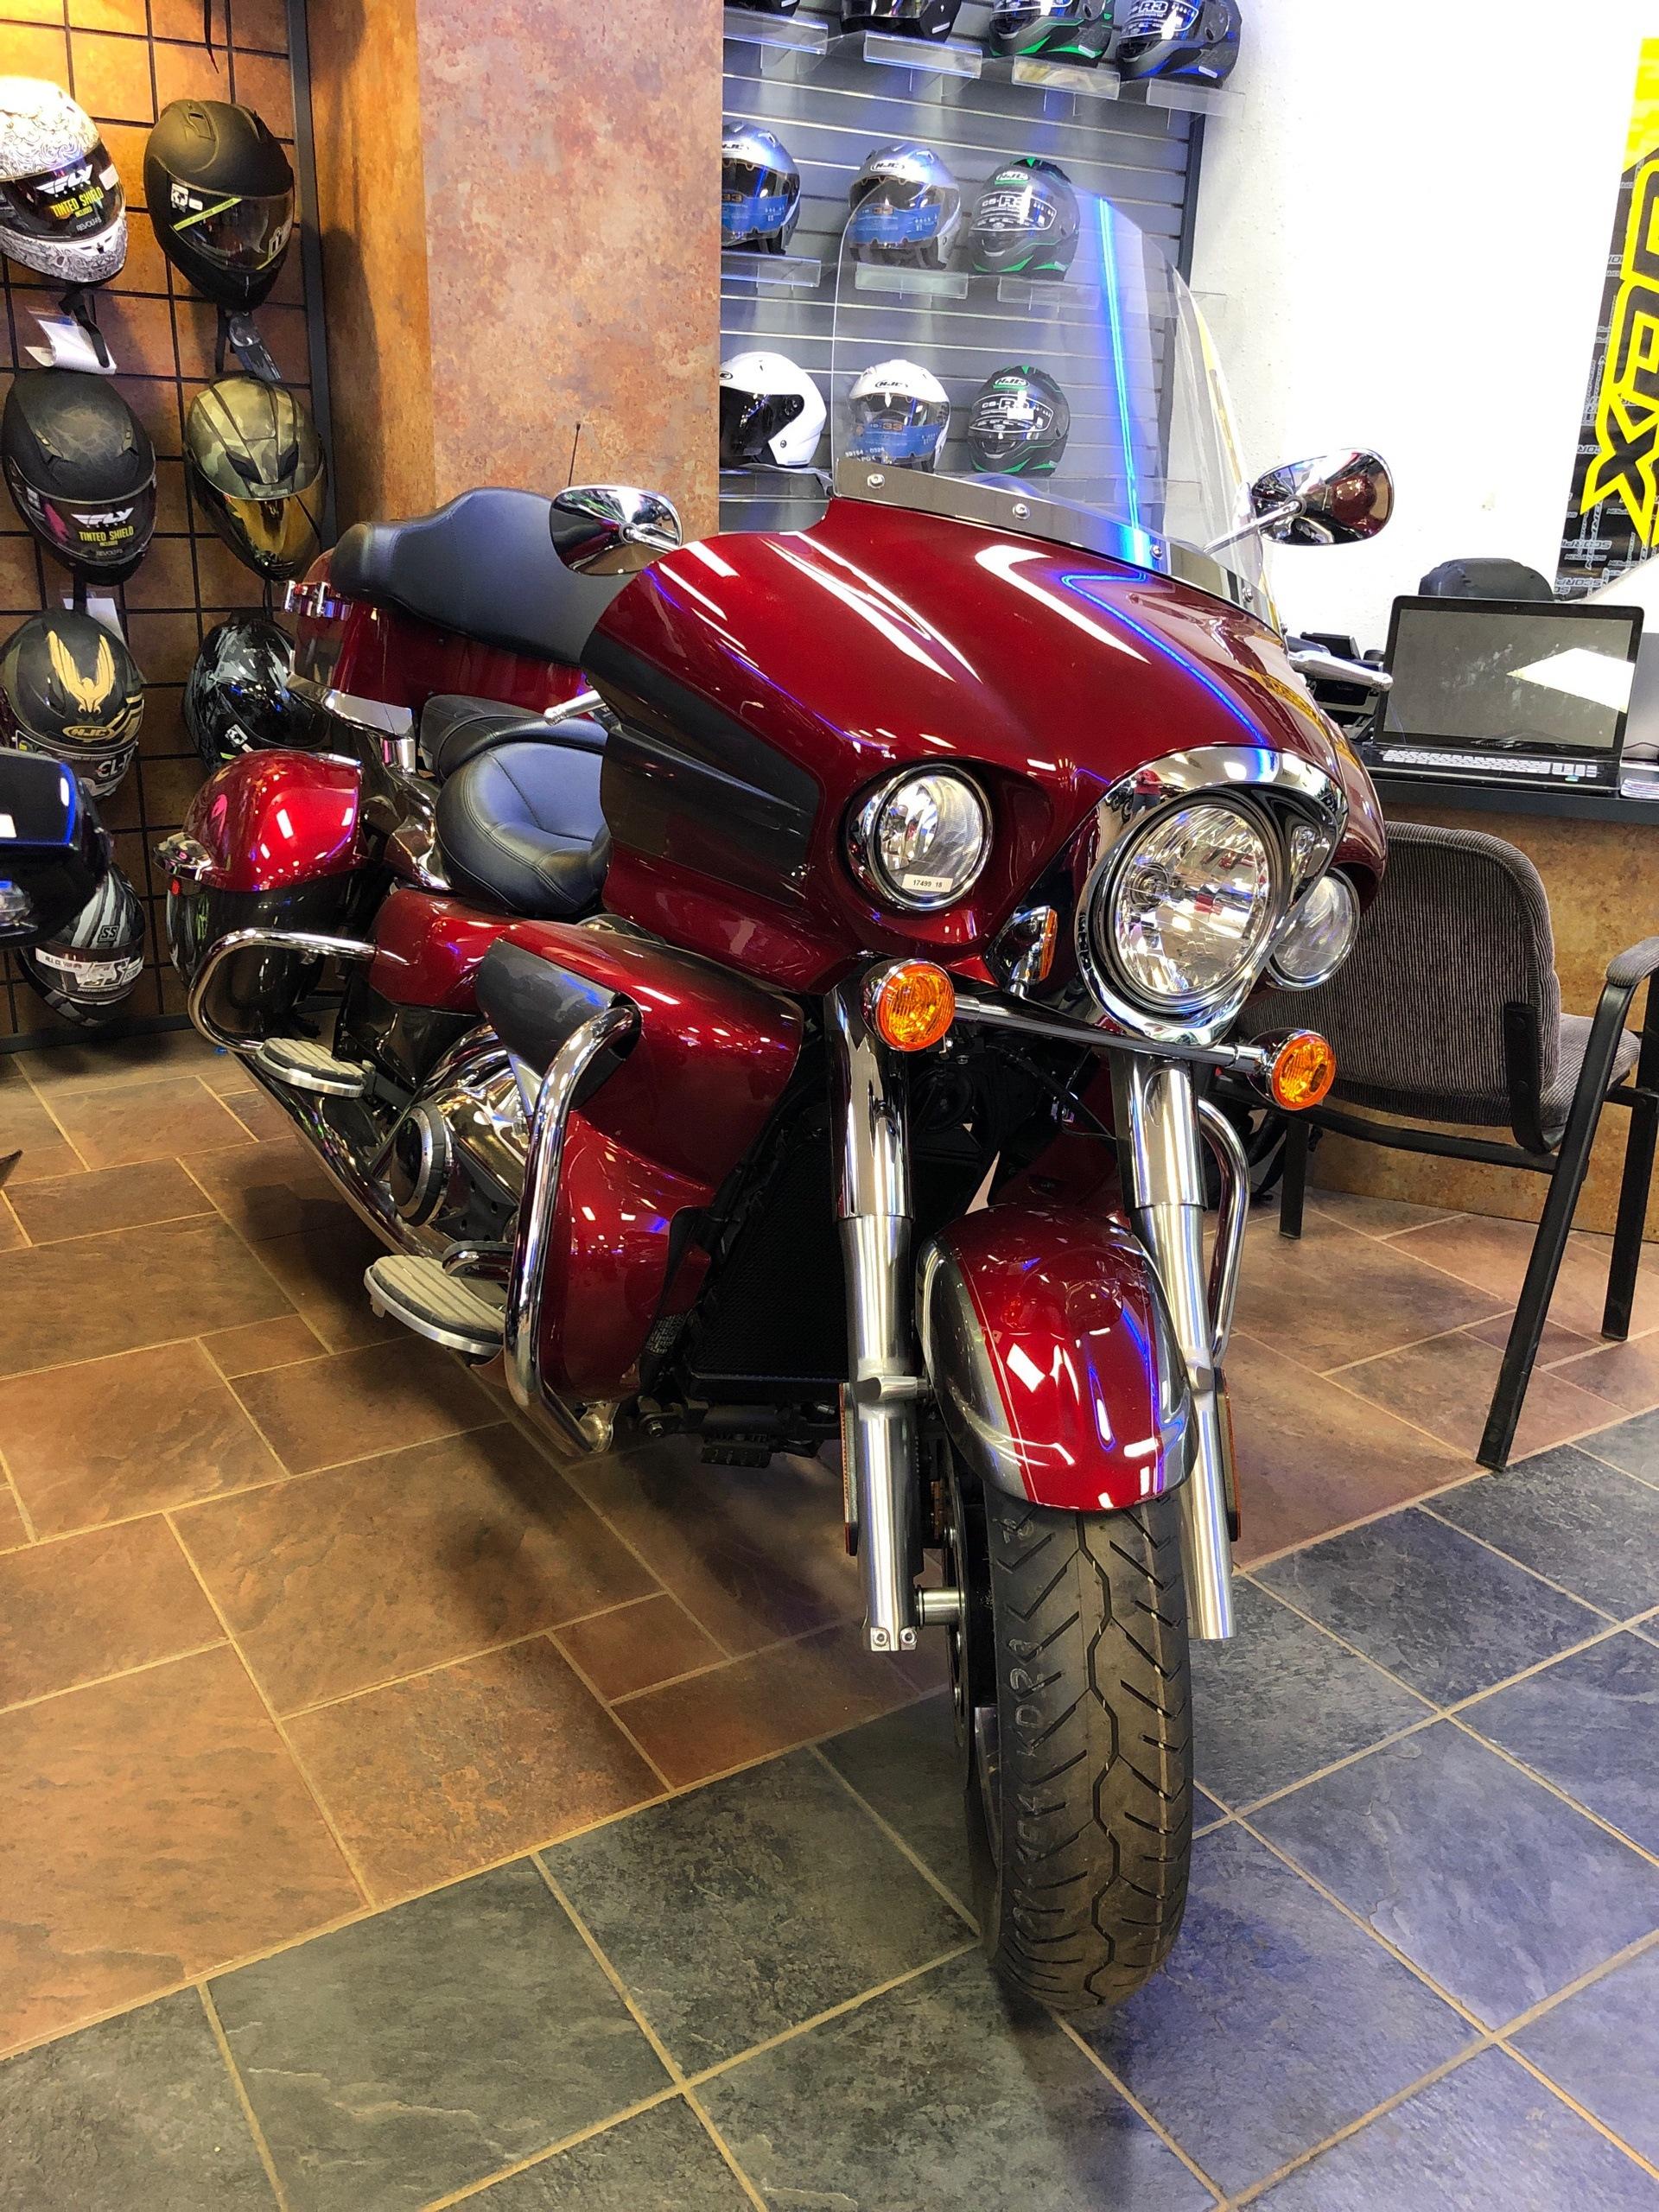 2018 Kawasaki Vulcan 1700 Voyager ABS for sale 8096